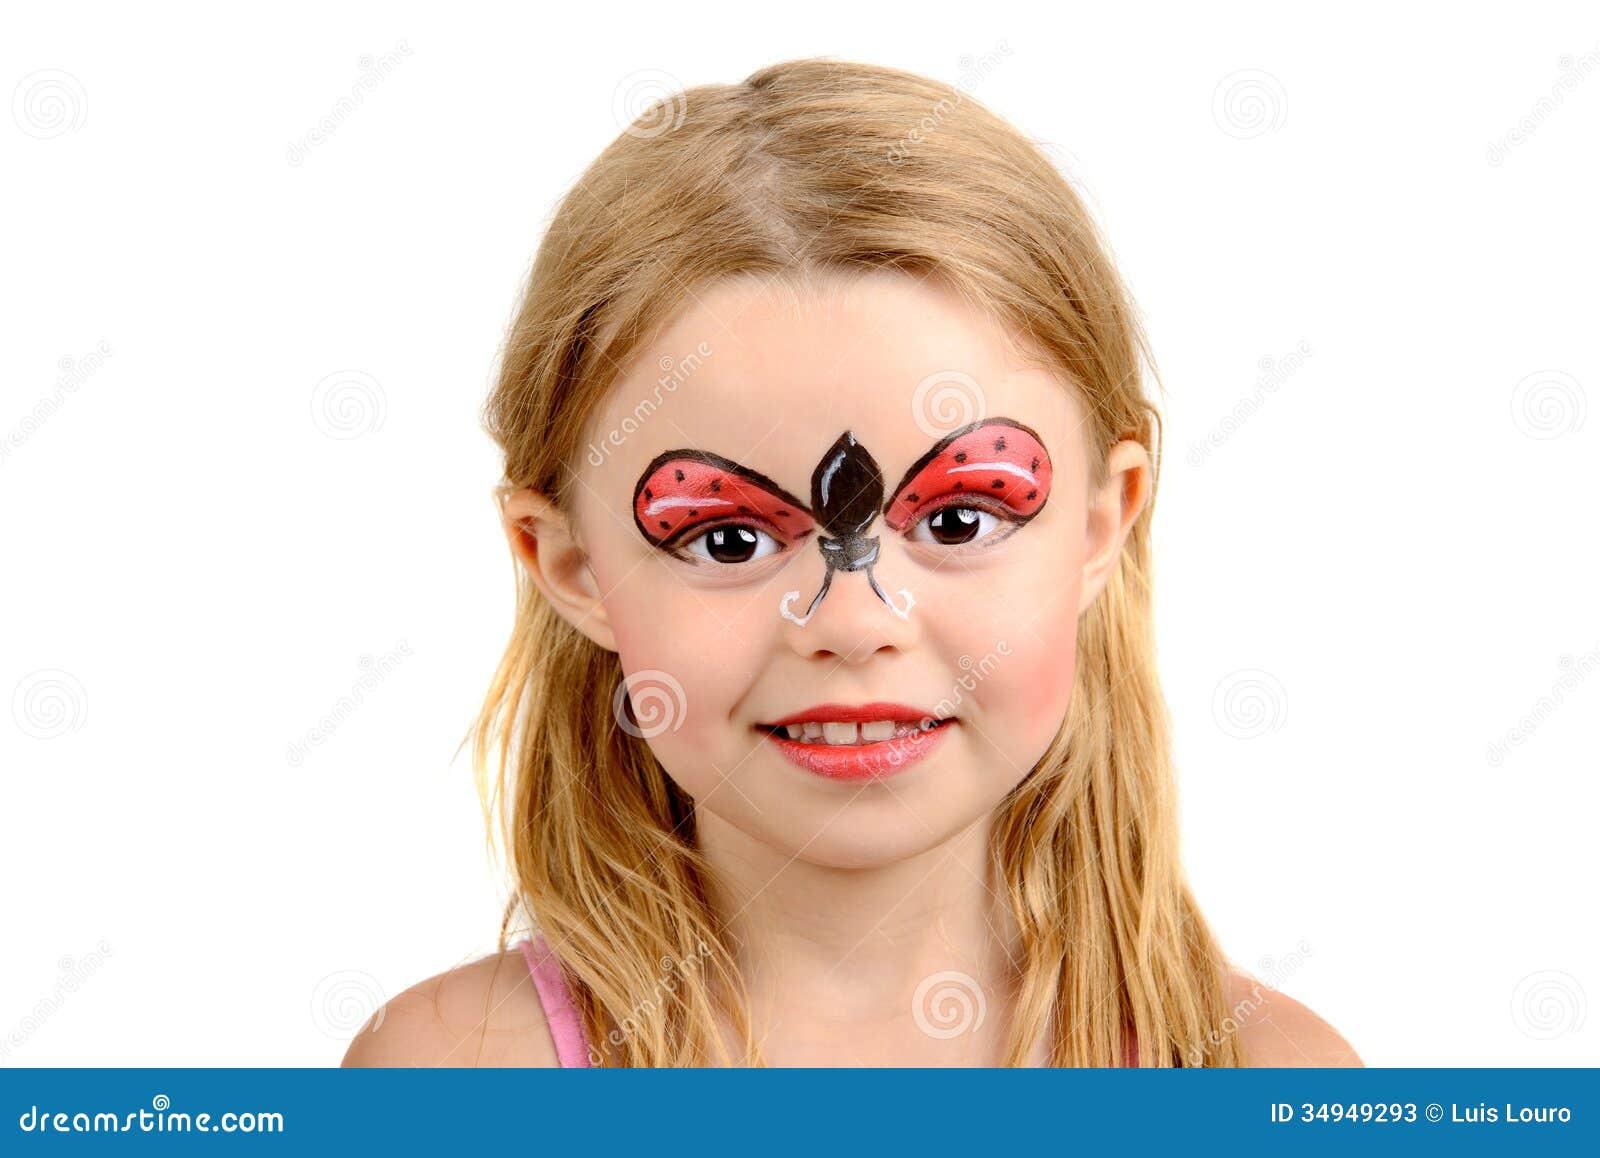 face painting ladybug stock photos image 34949293. Black Bedroom Furniture Sets. Home Design Ideas